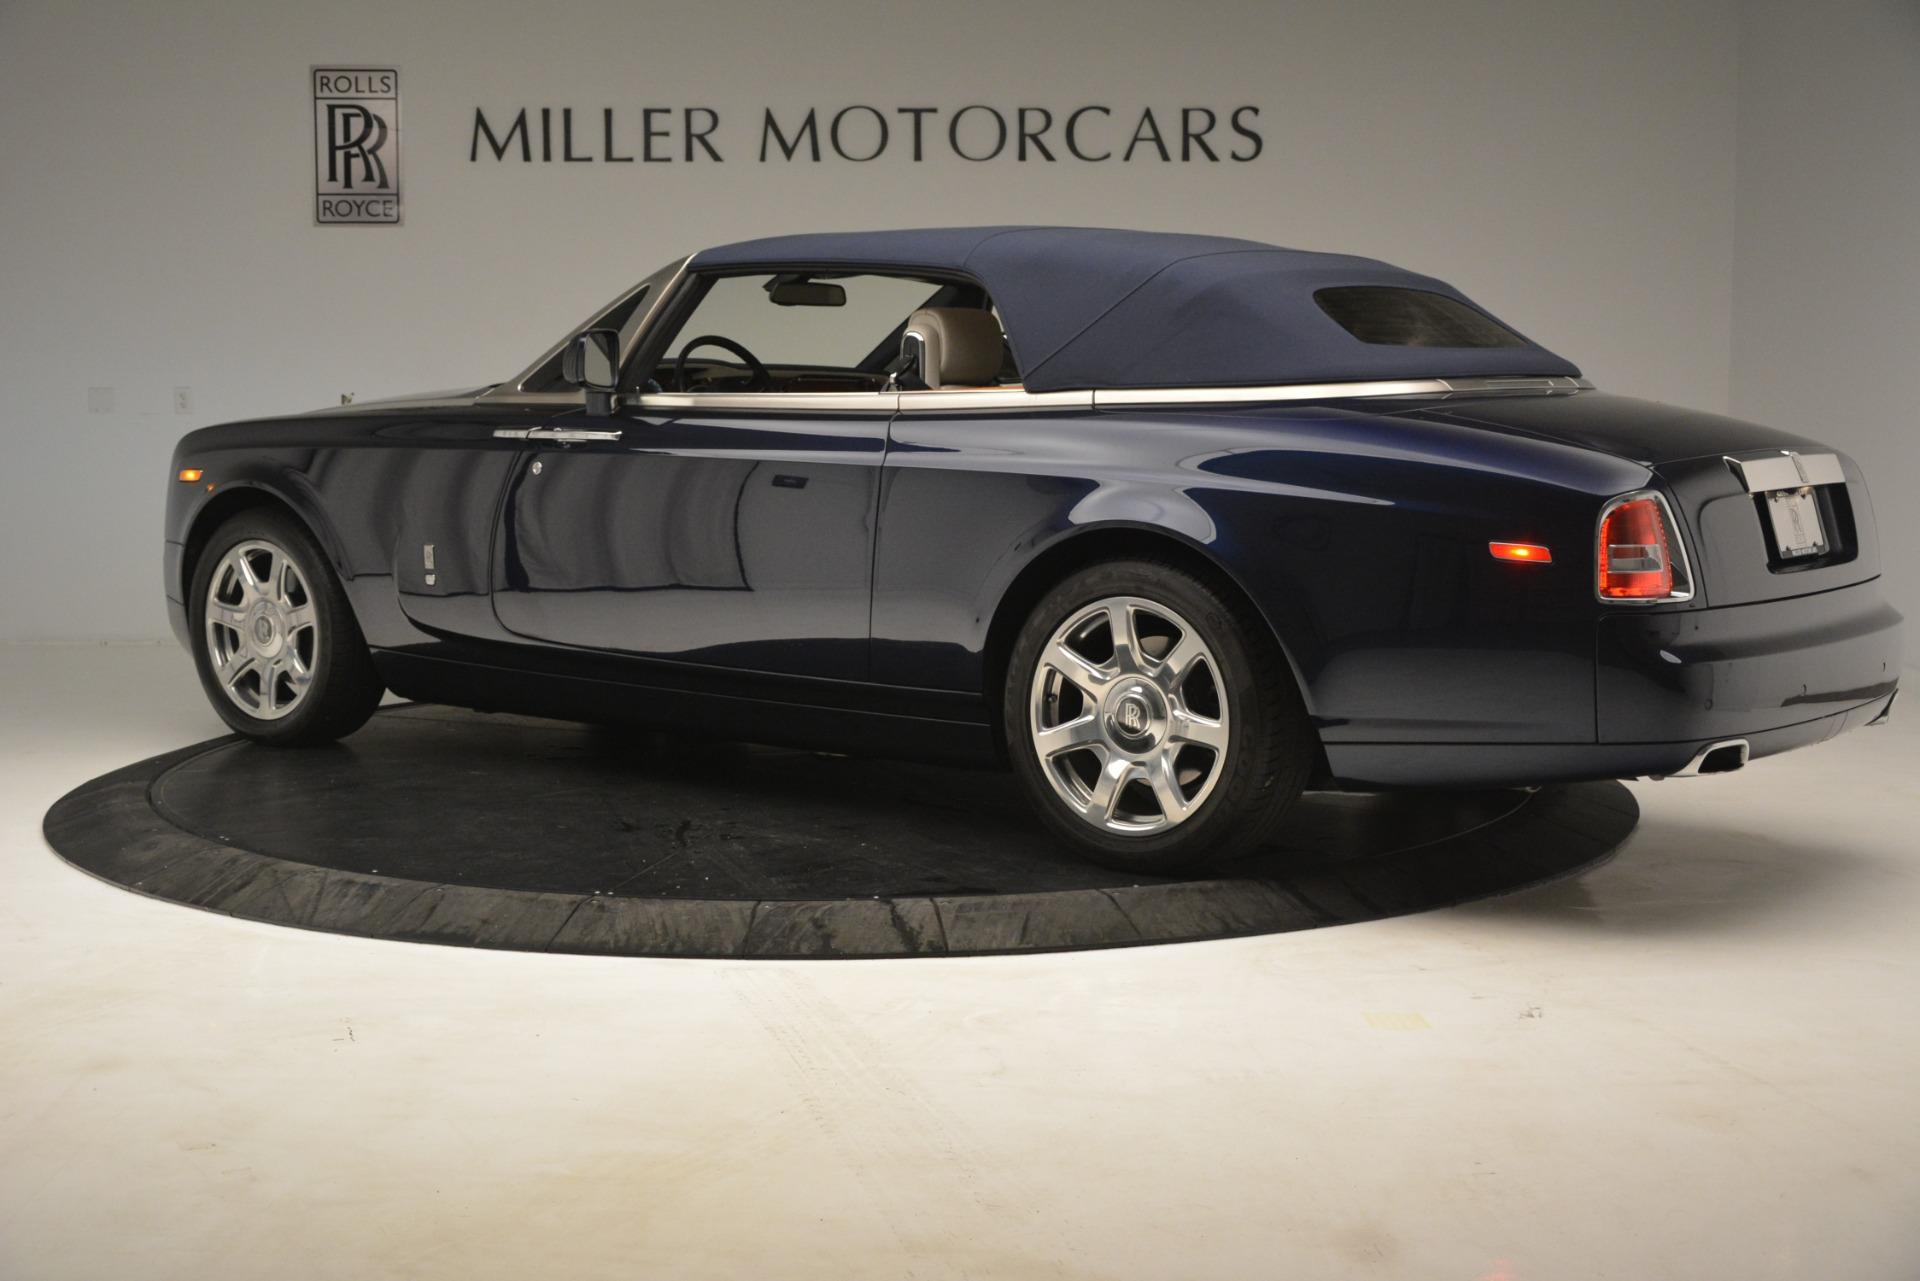 Used 2013 Rolls Royce Phantom Drophead Coupe